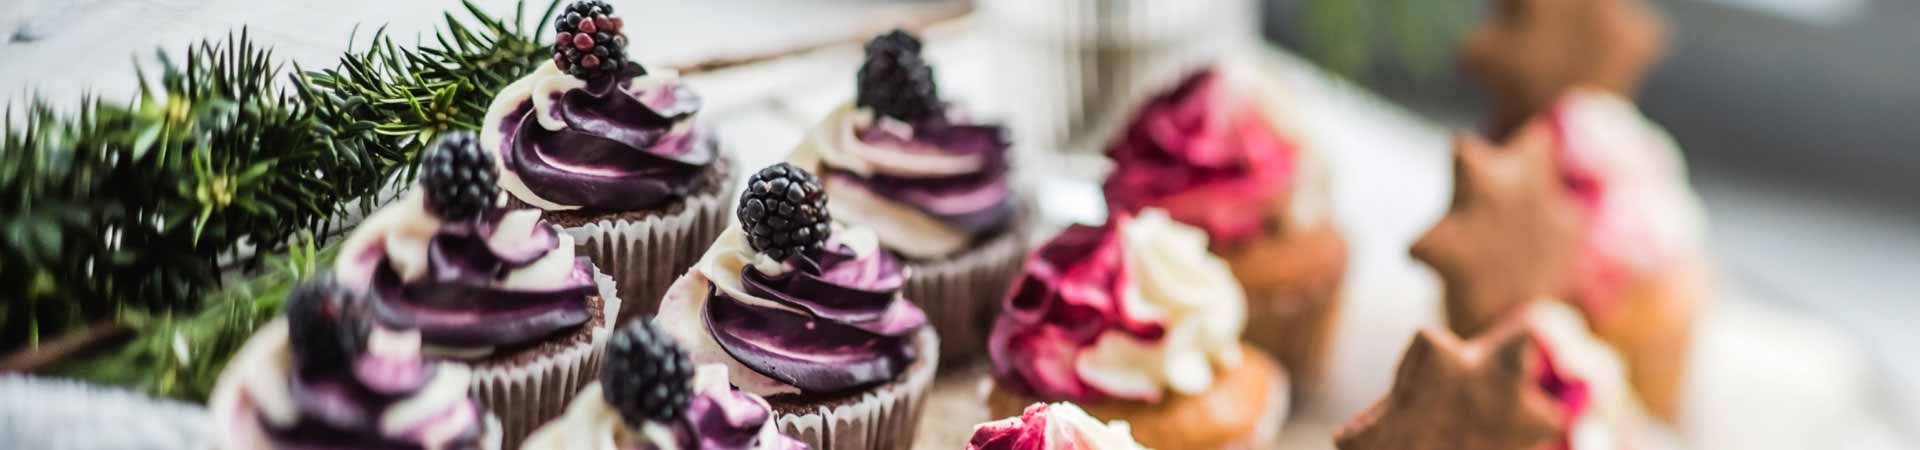 Header Cupcakes